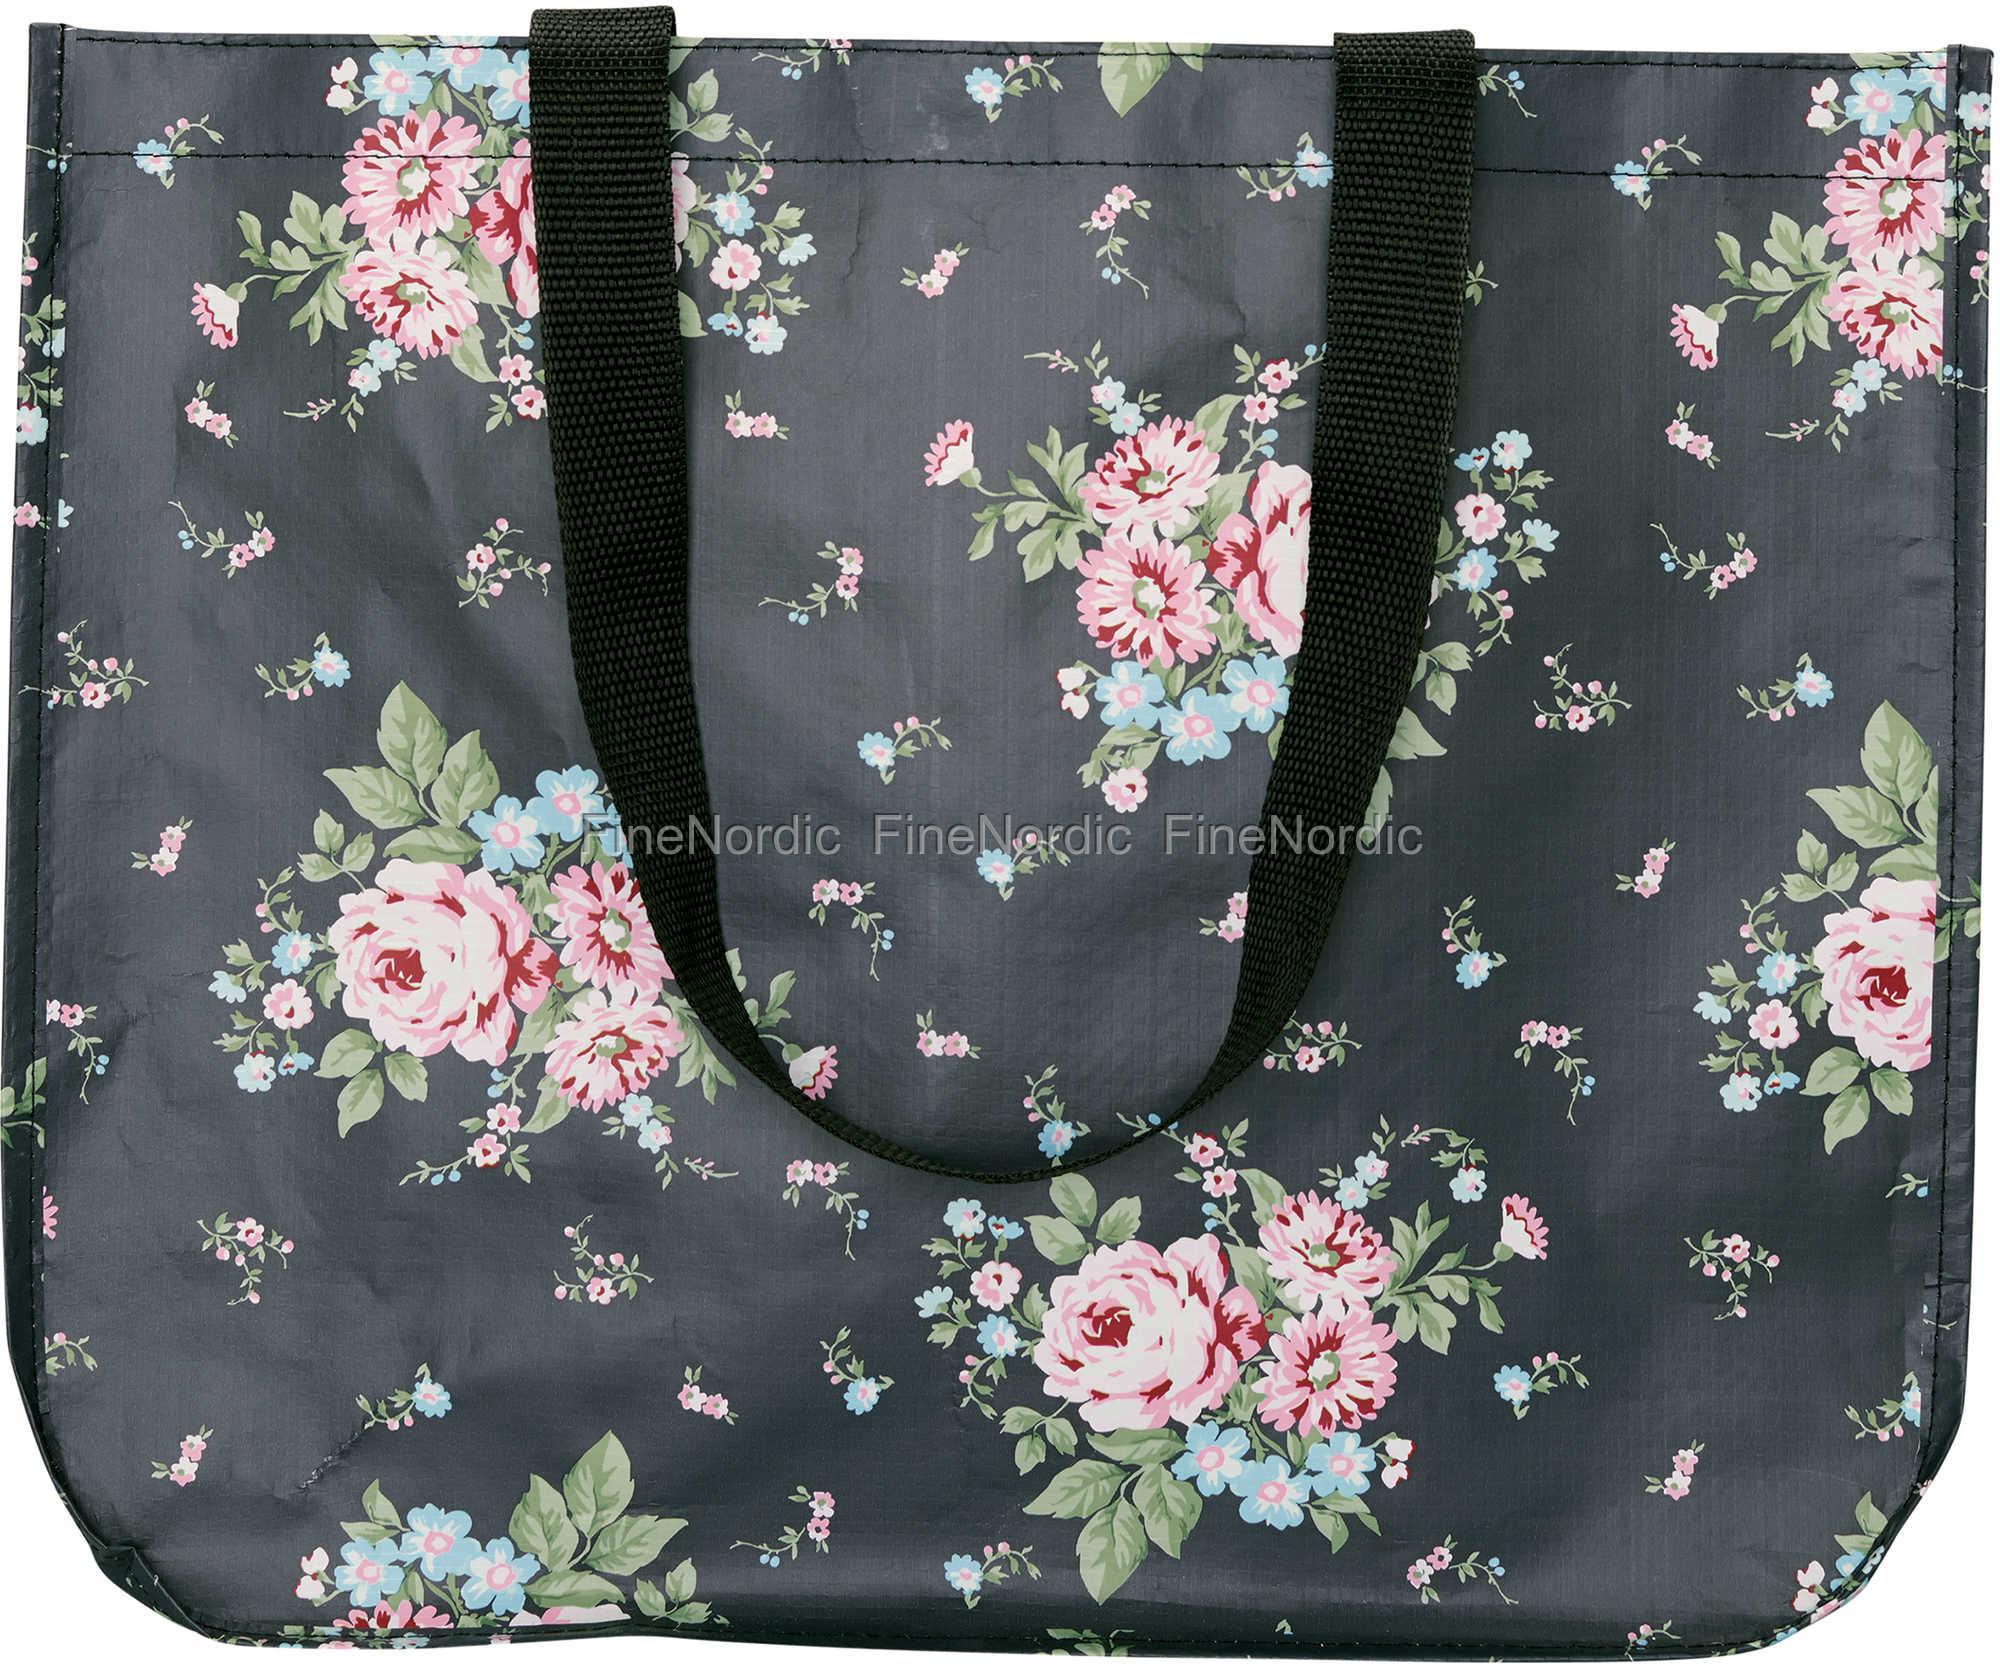 GreenGate Shopper Bag Marley Dark Grey Round Bottom